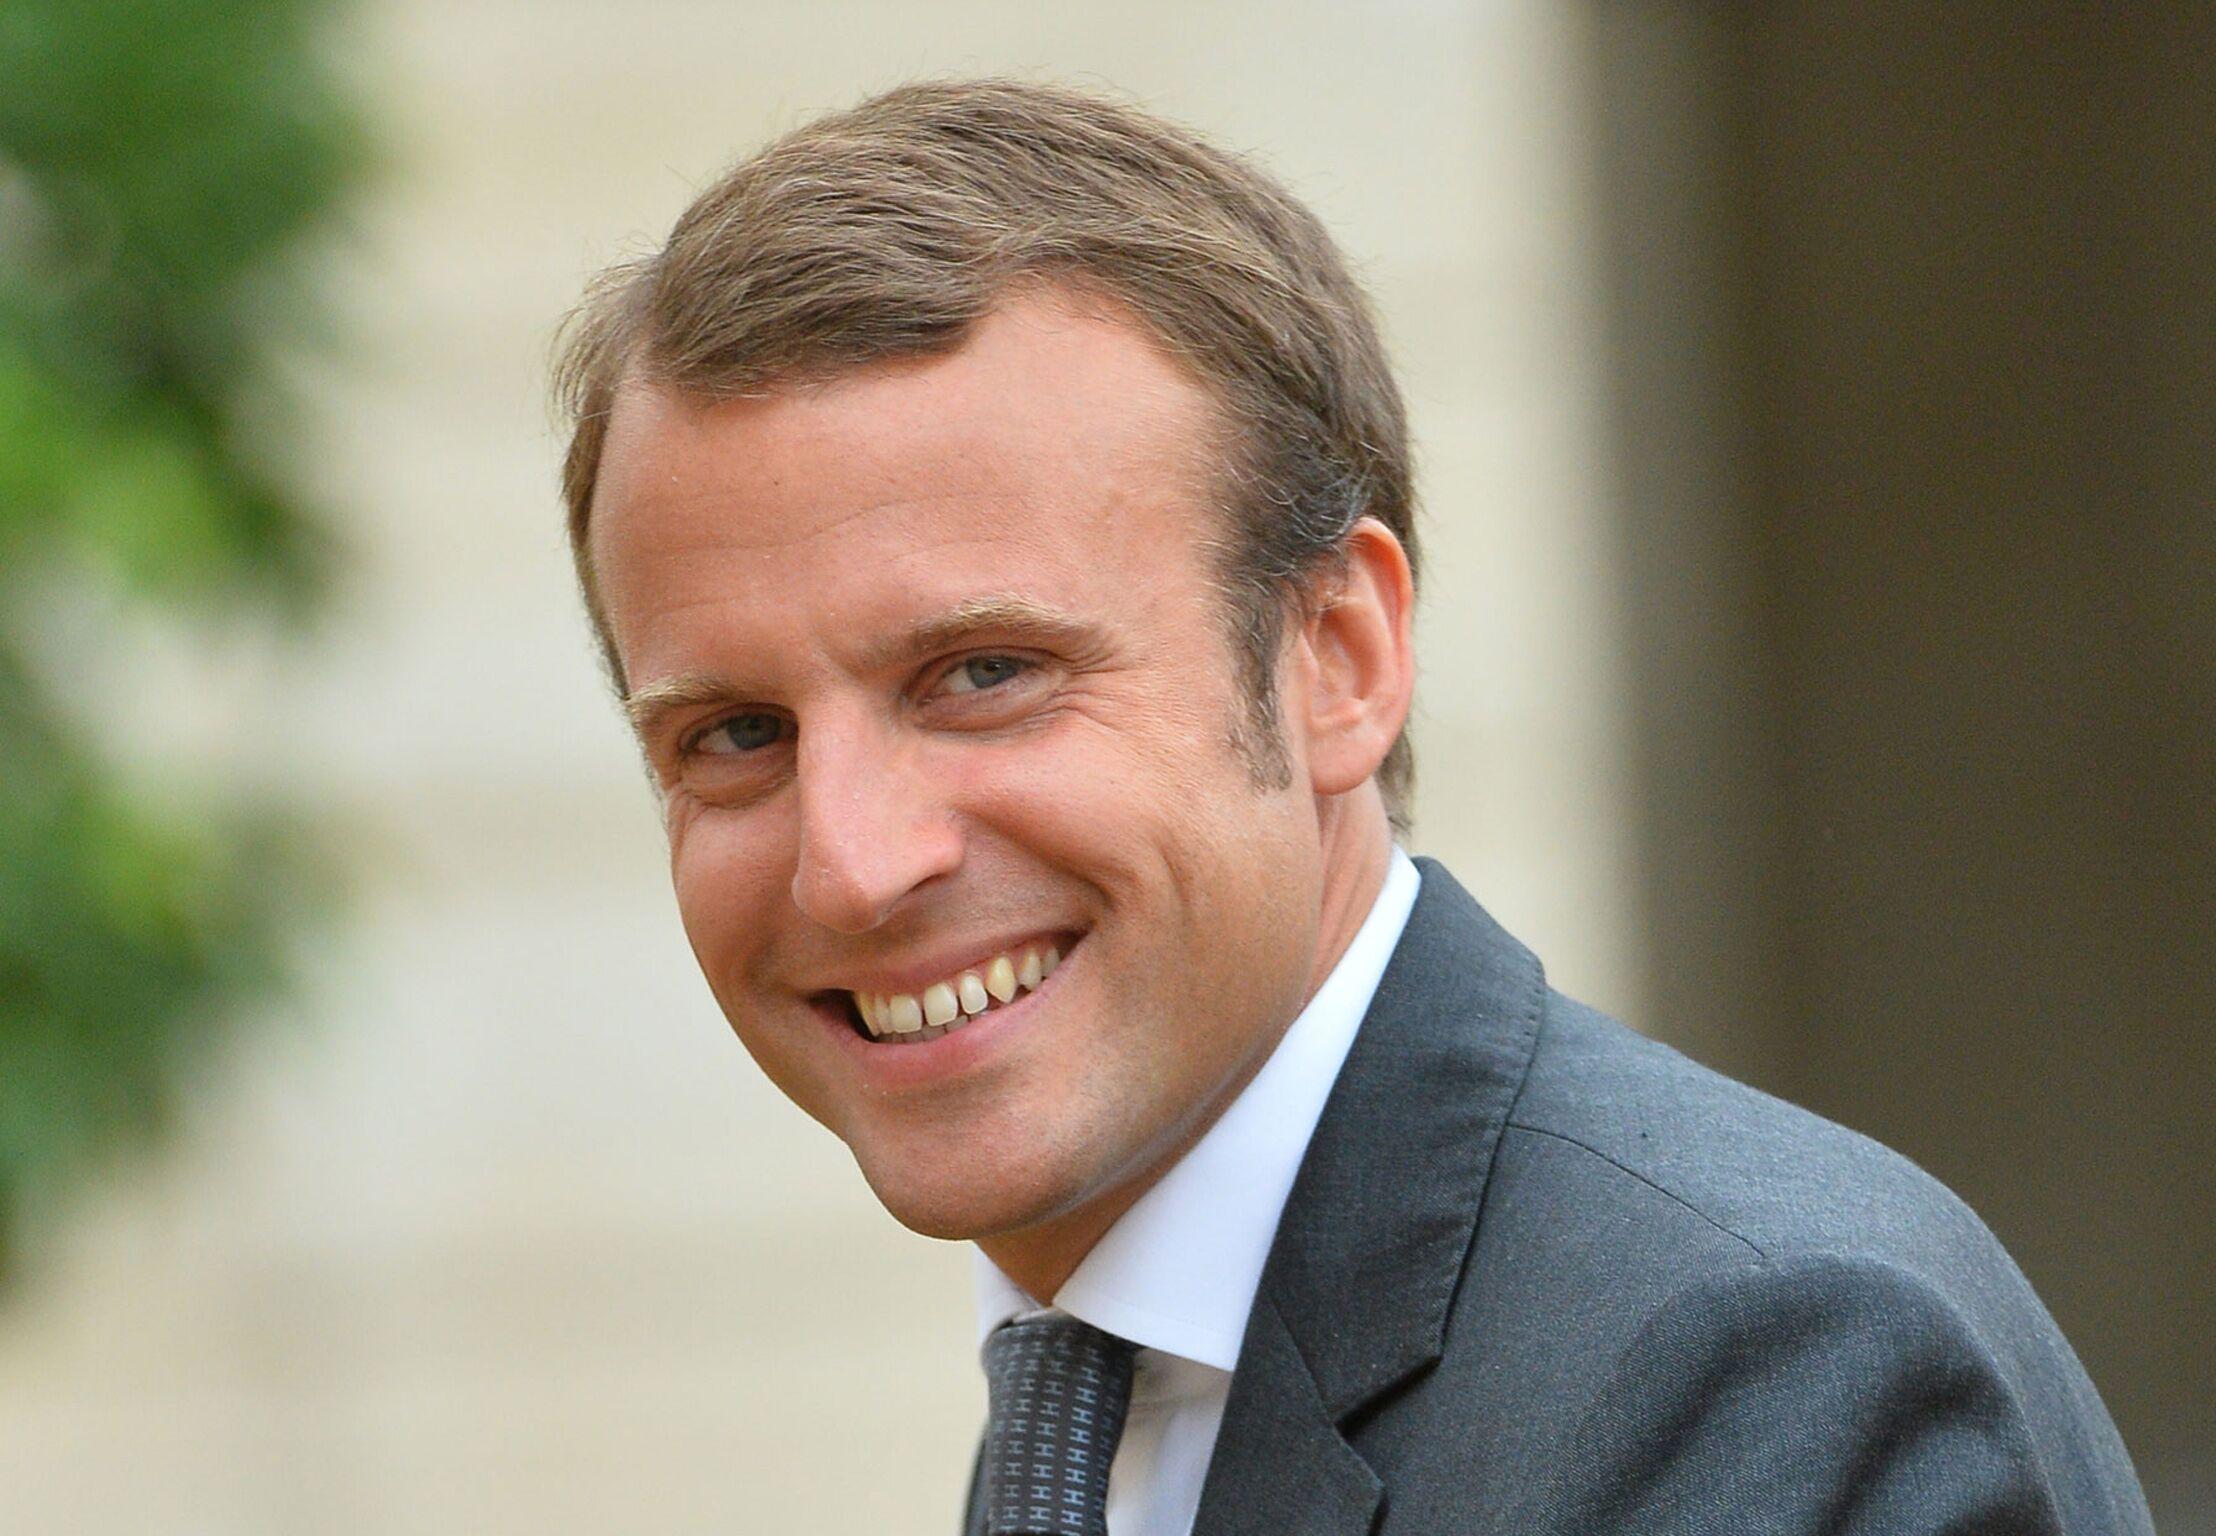 Emmanuel Macron La Biographie De Emmanuel Macron Avec Gala Fr